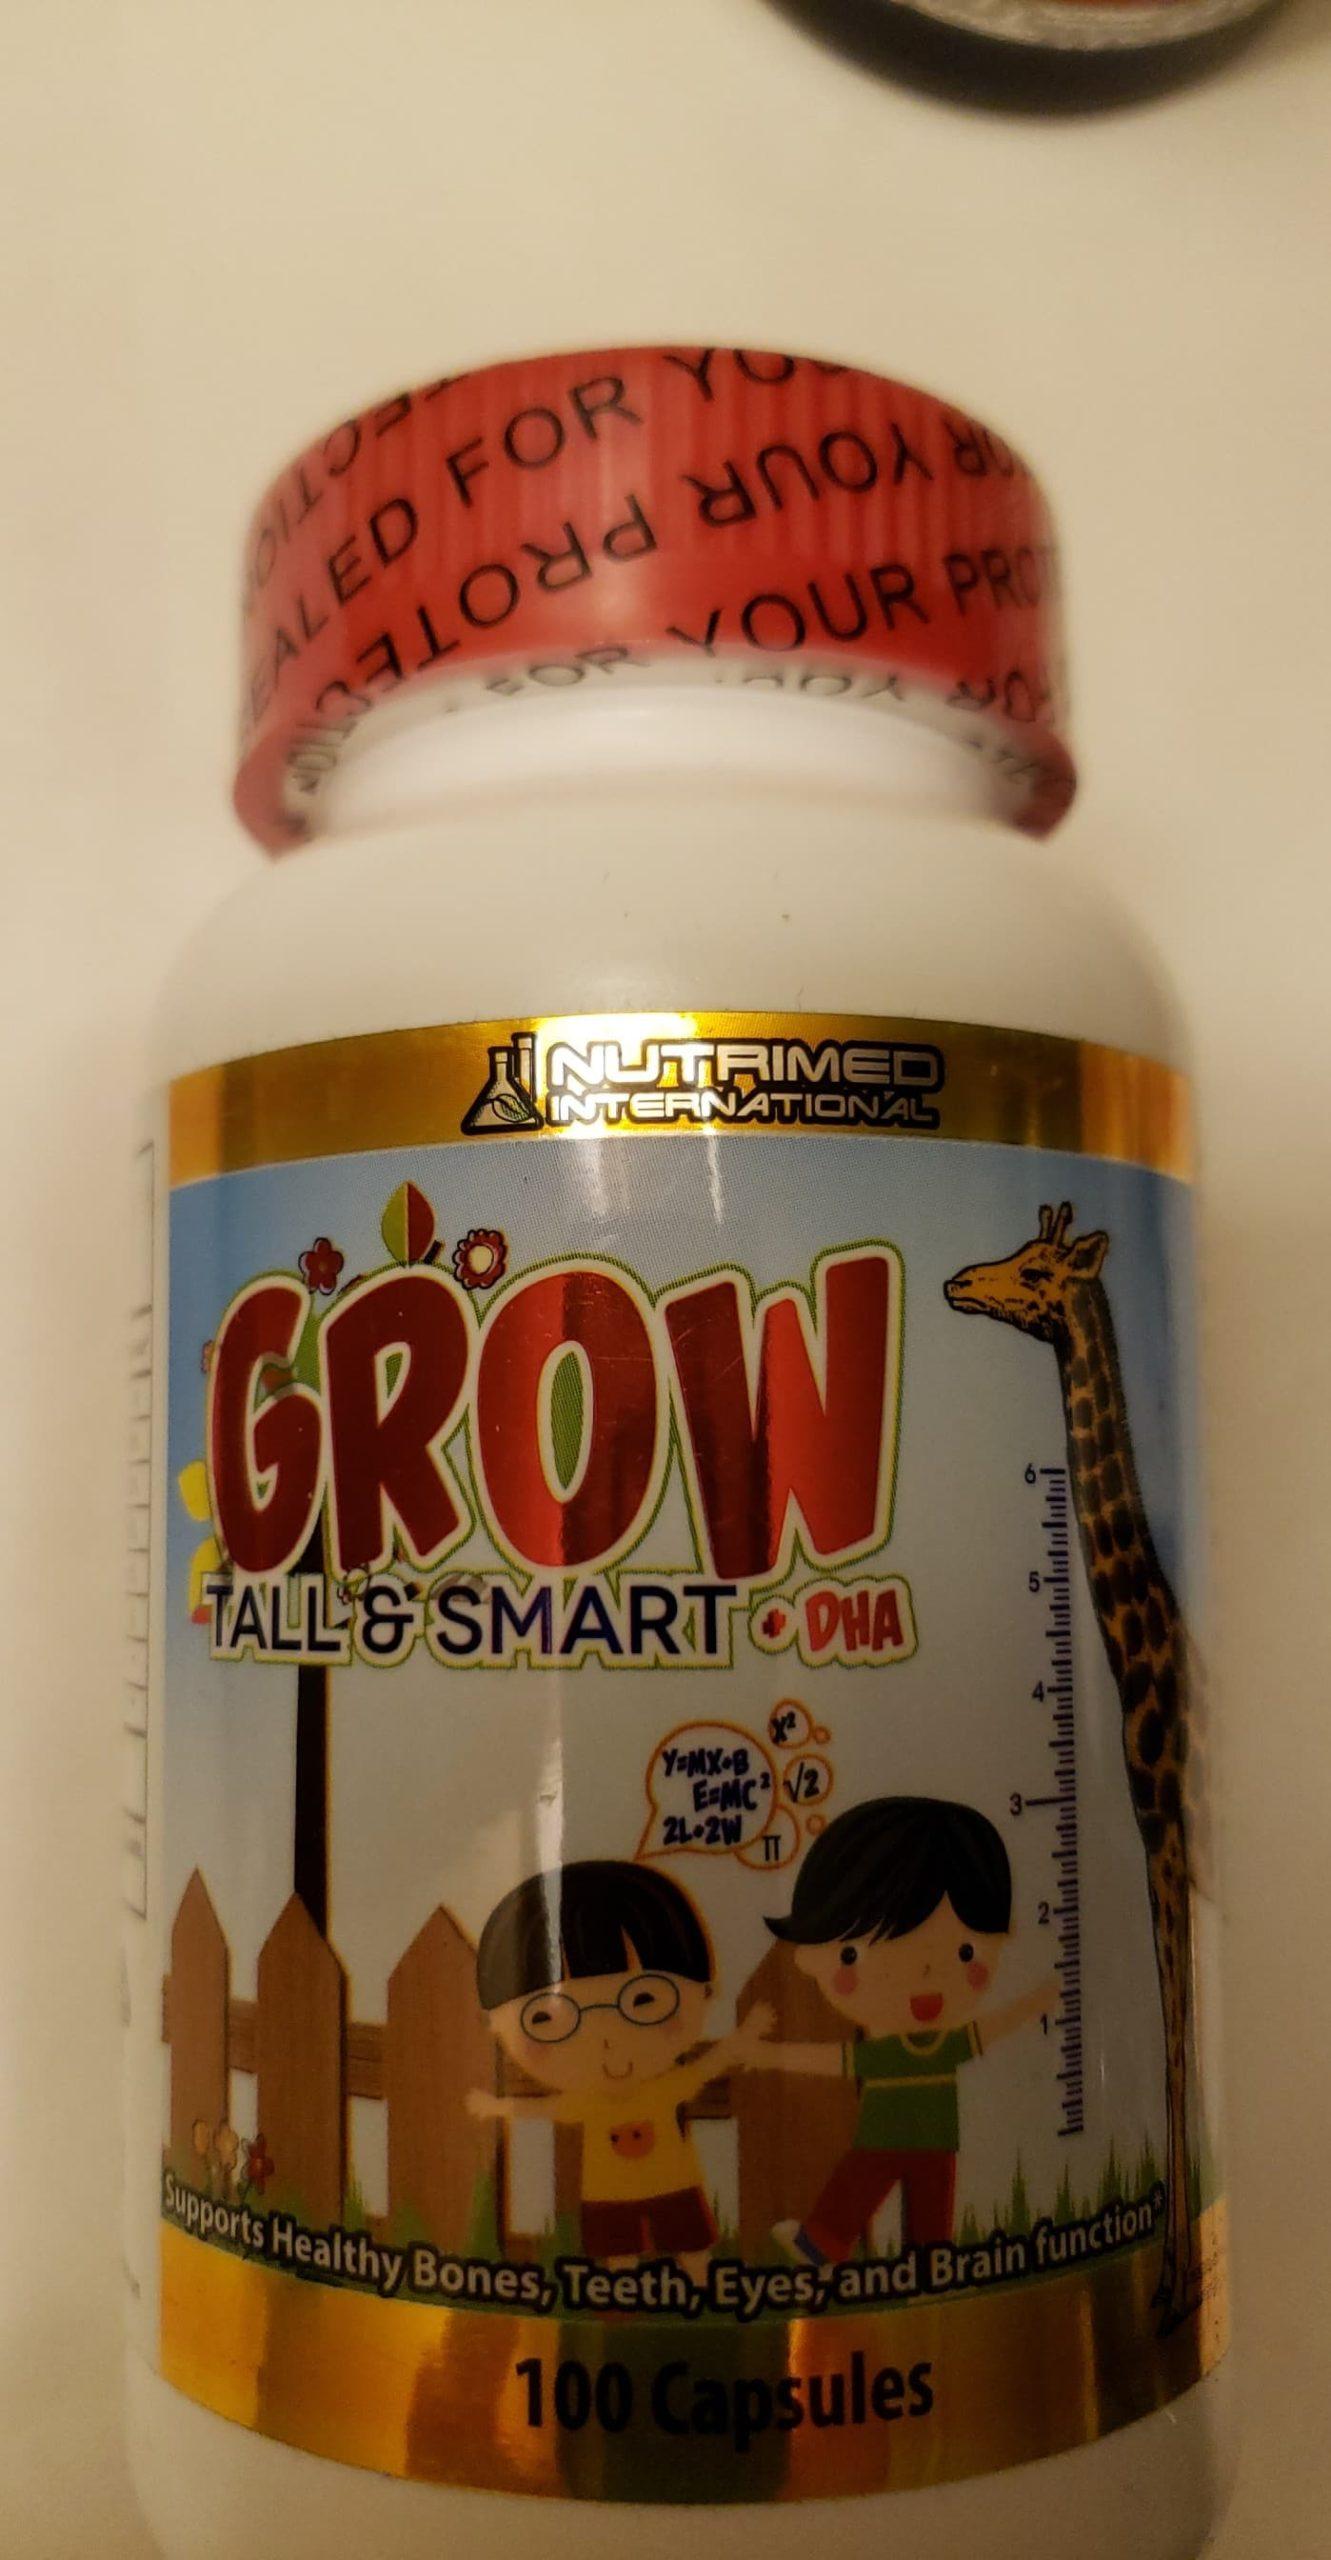 Grow Tall & Smart